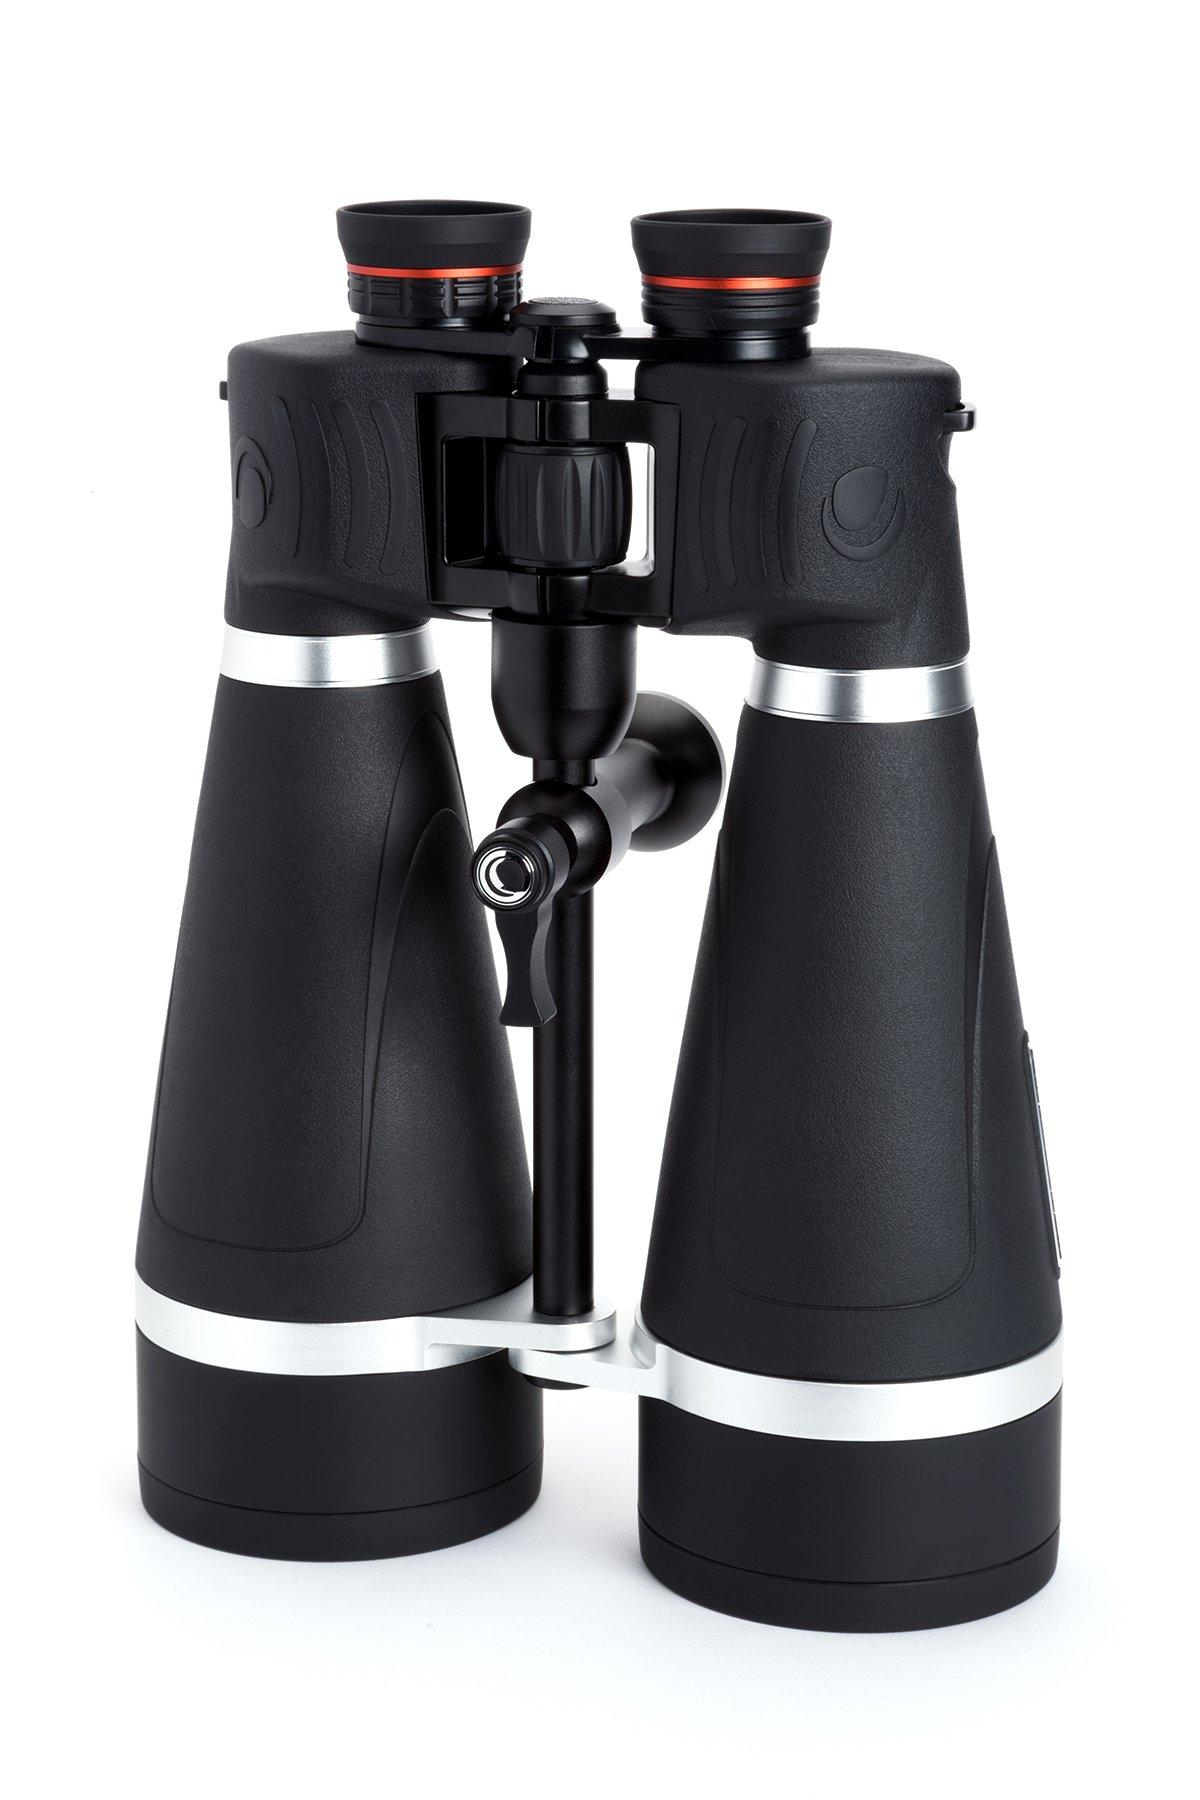 Celestron 20x80 SkyMaster Pro High Power Astronomy Binoculars by Celestron (Image #4)